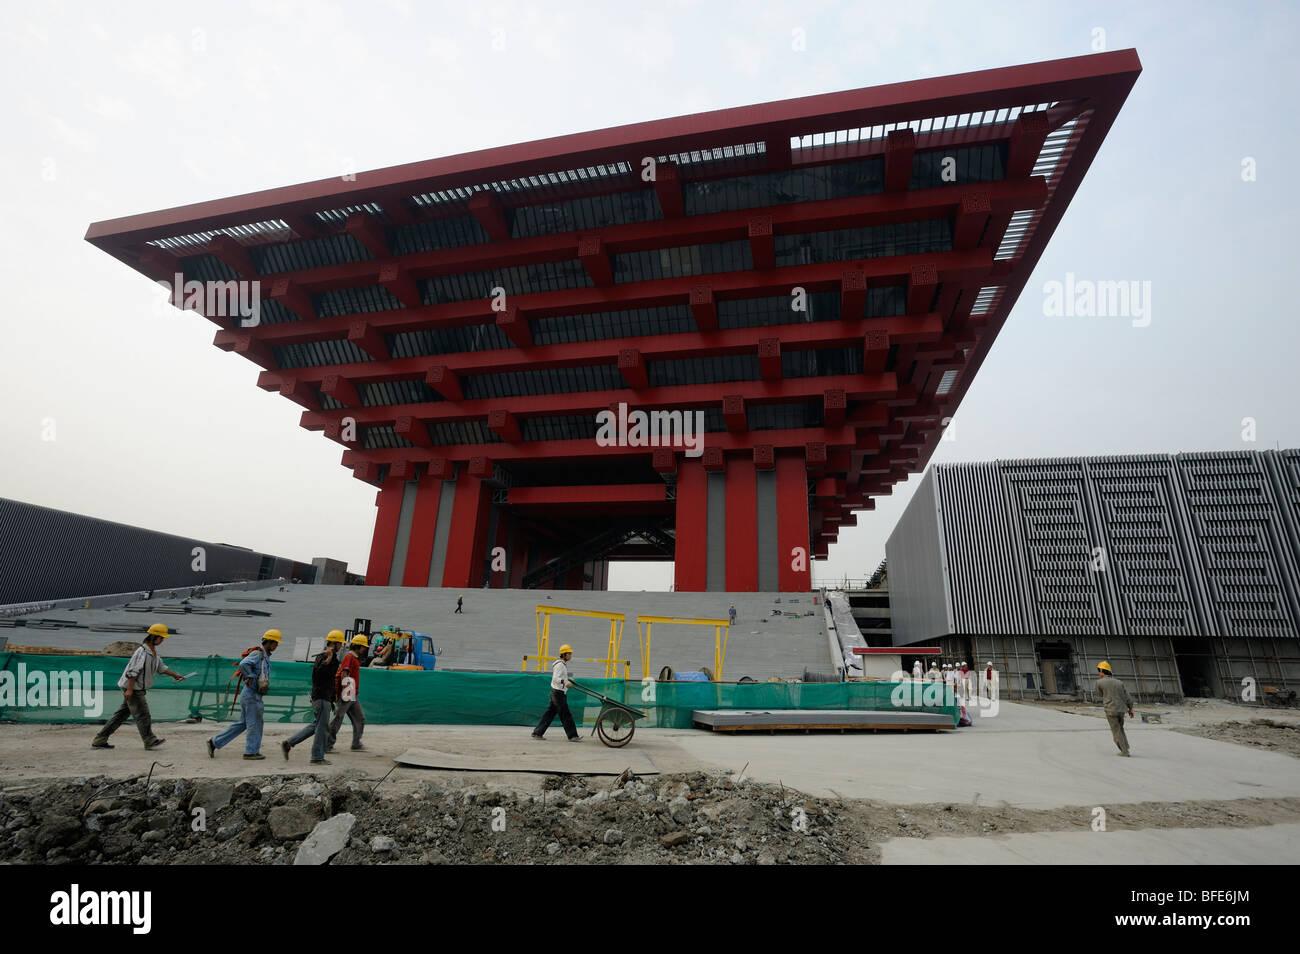 Obras de construcción de Pabellón de China de la Expo Mundial 2010 en Shanghai, China.15-Oct-2009 Imagen De Stock